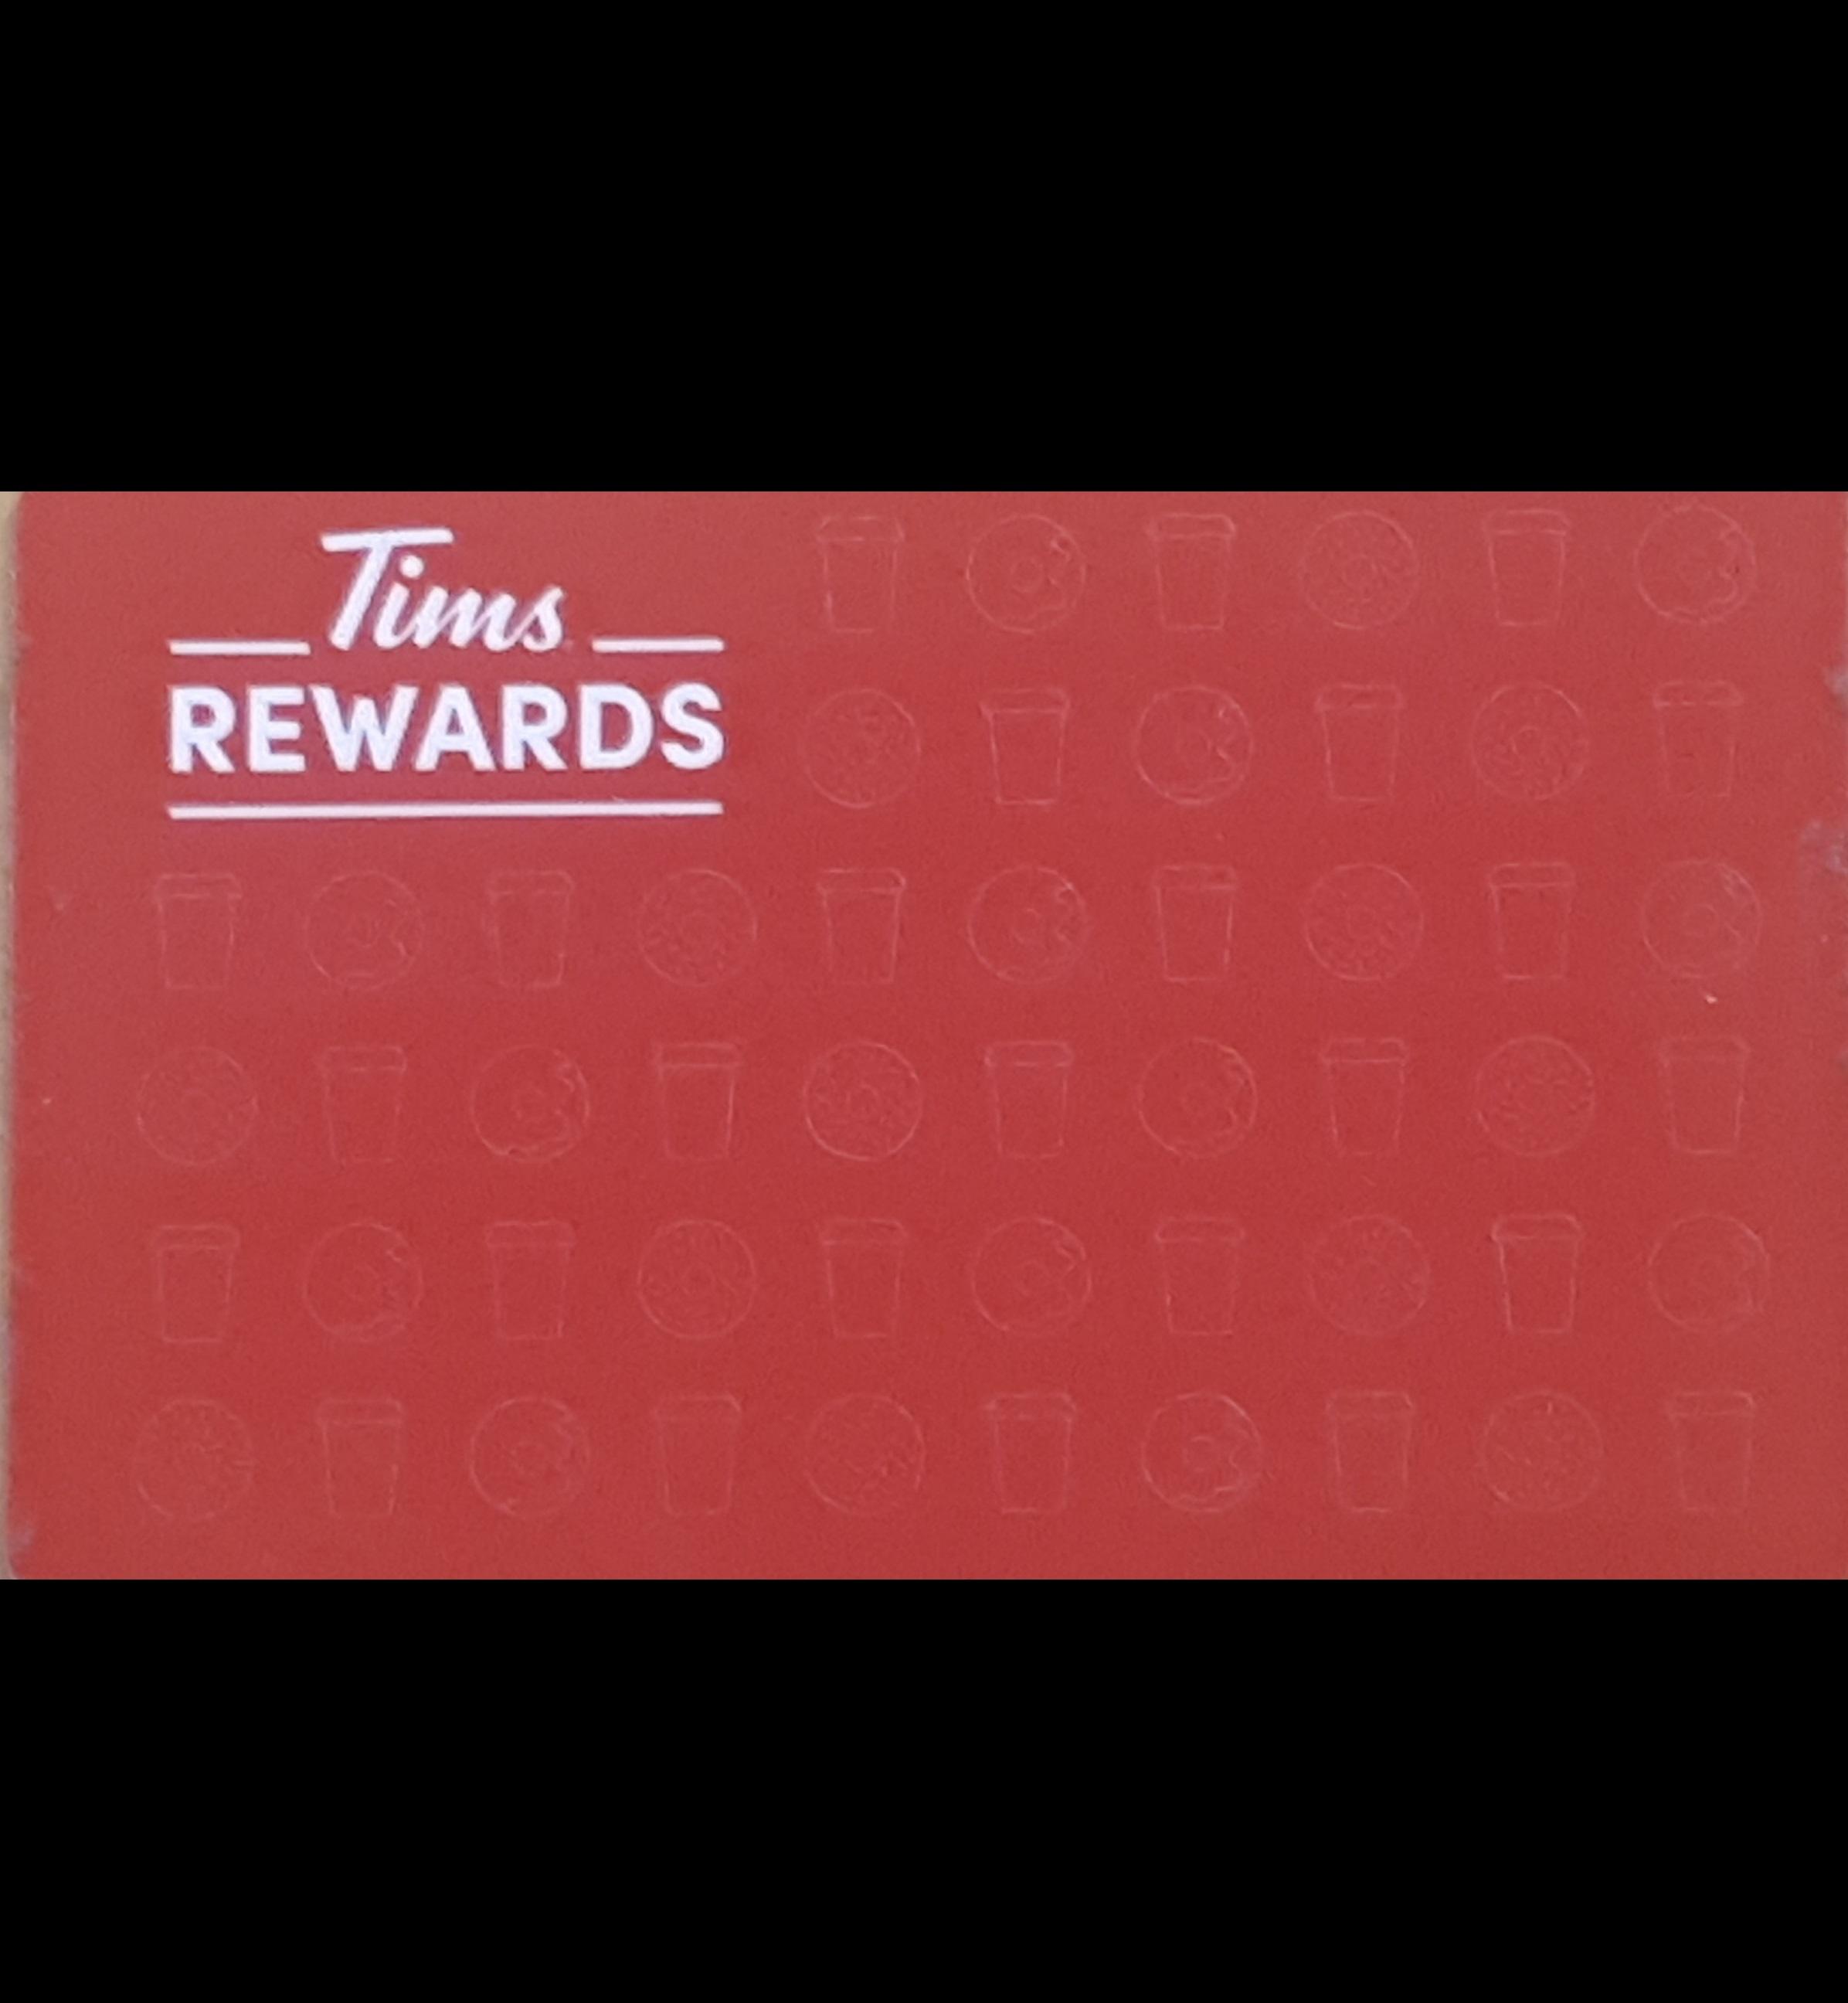 Tims Card